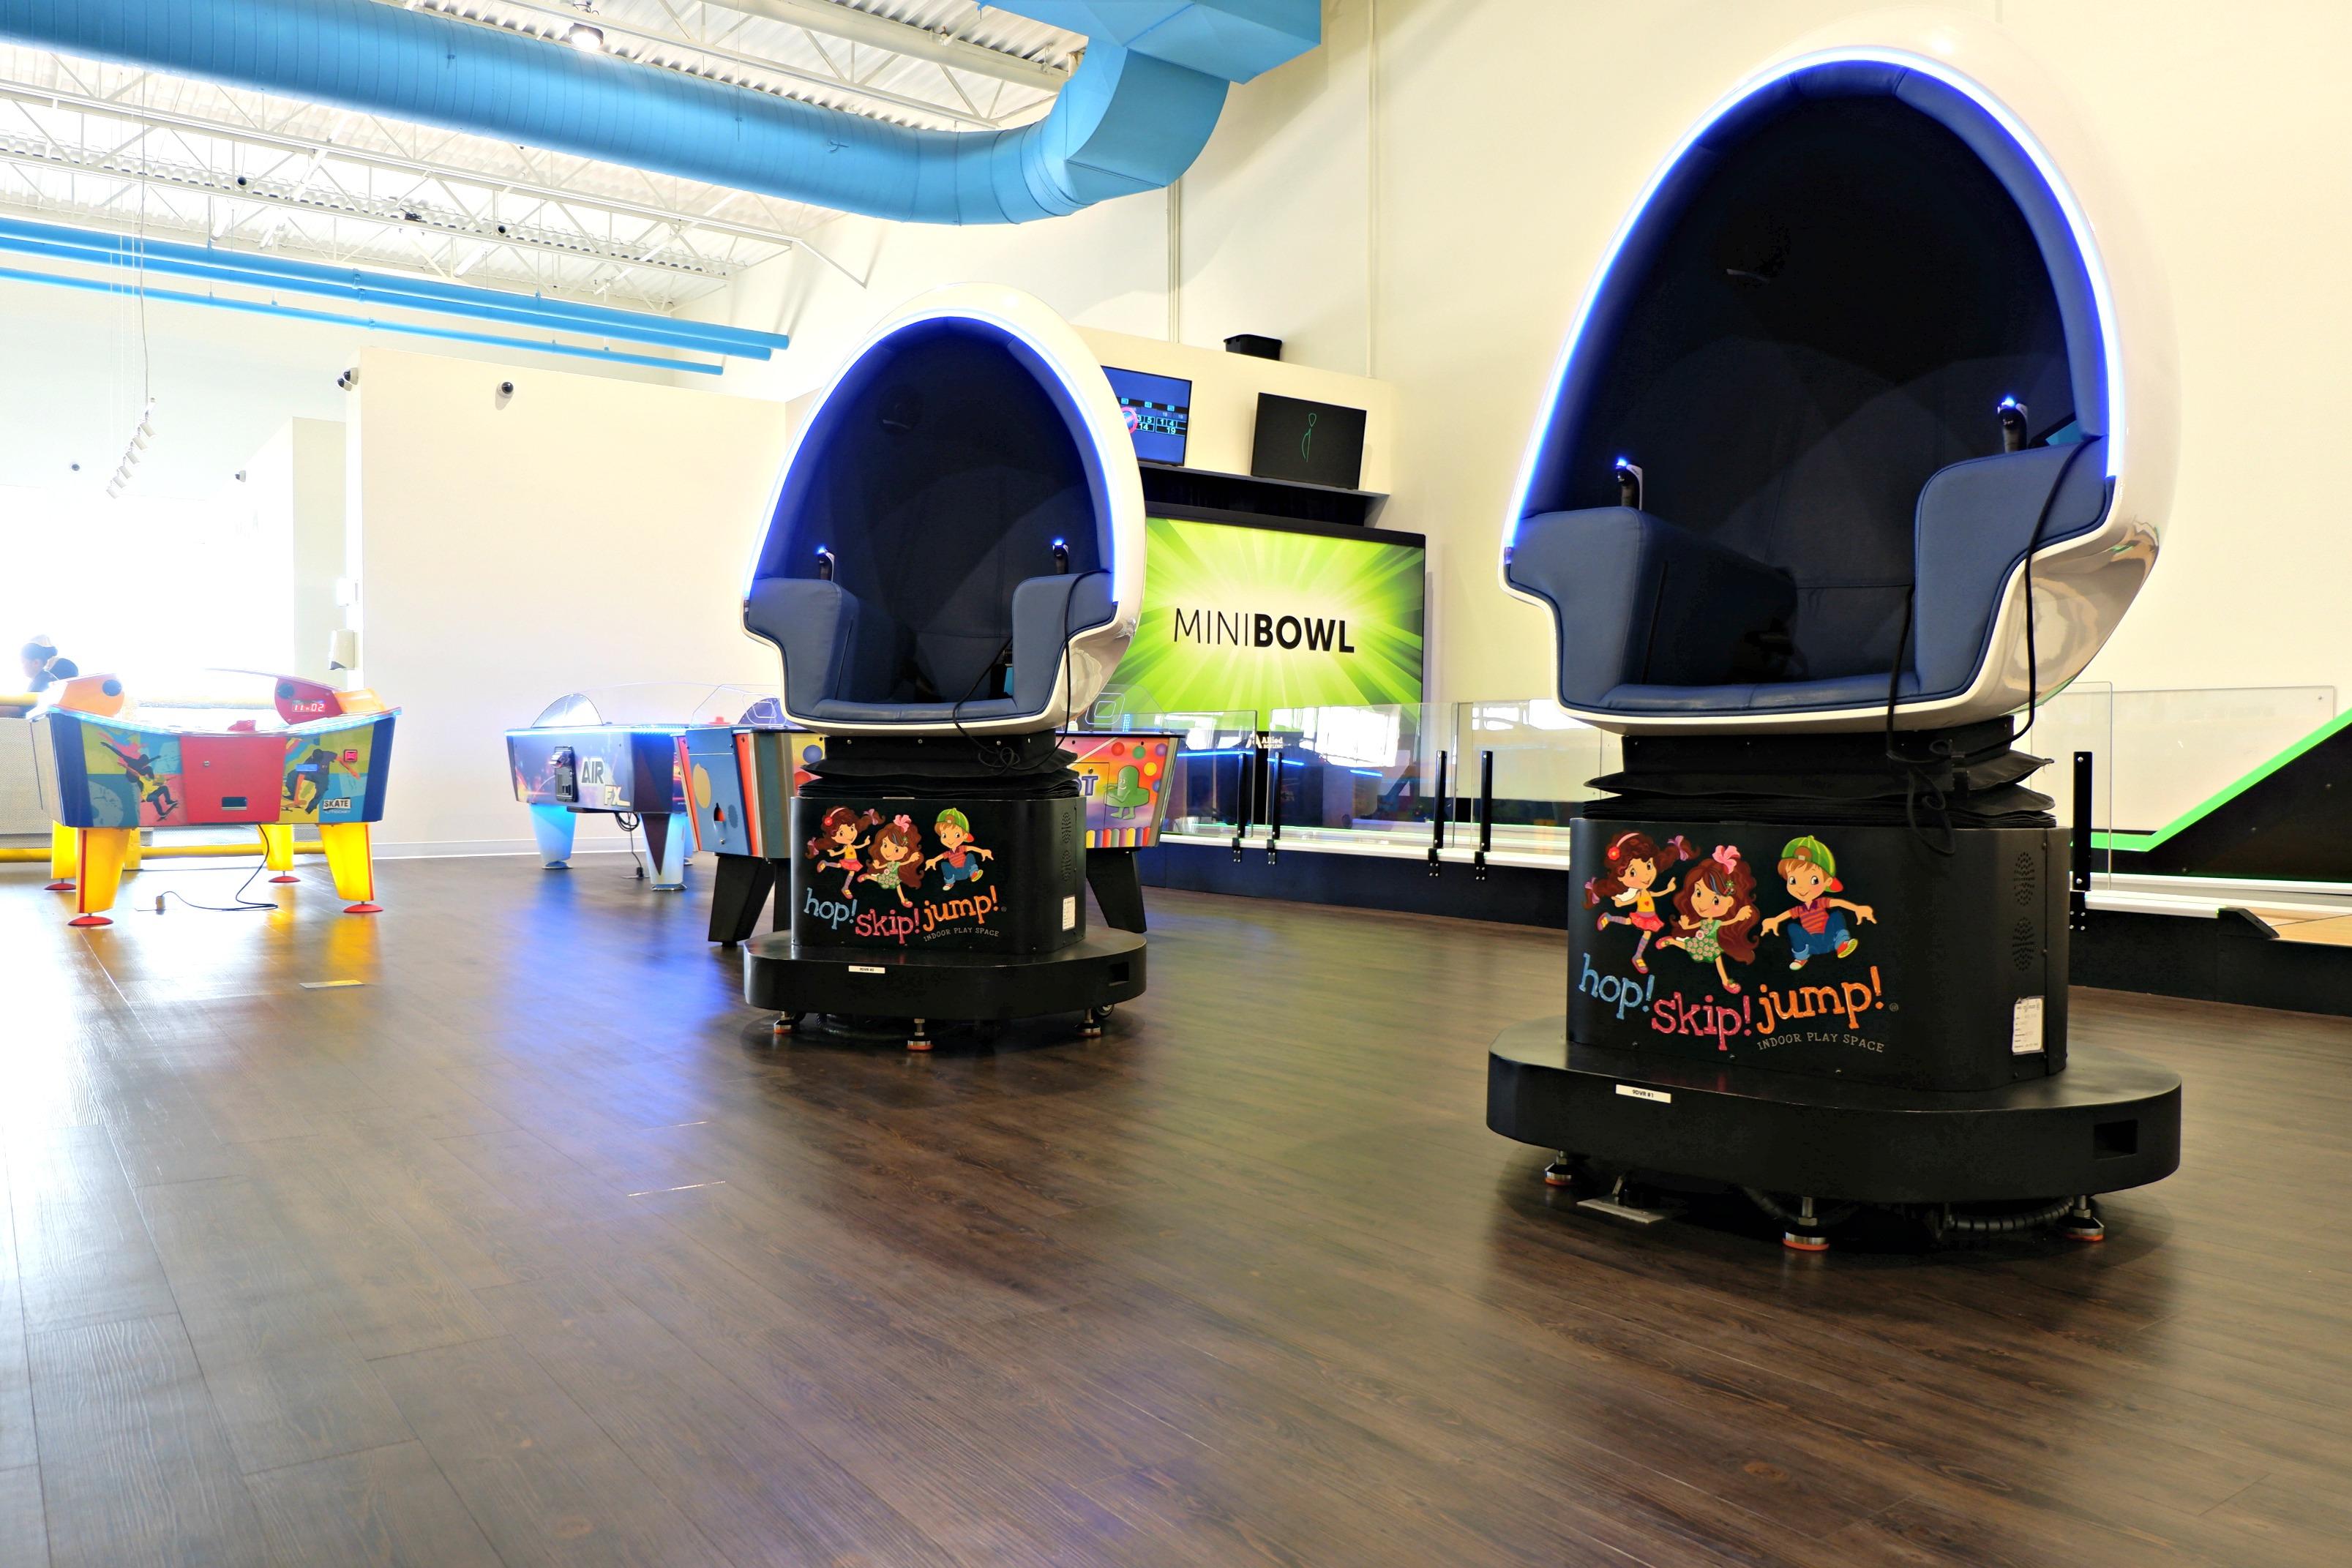 arcade moncton riverview dieppe indoor fun virtual reality